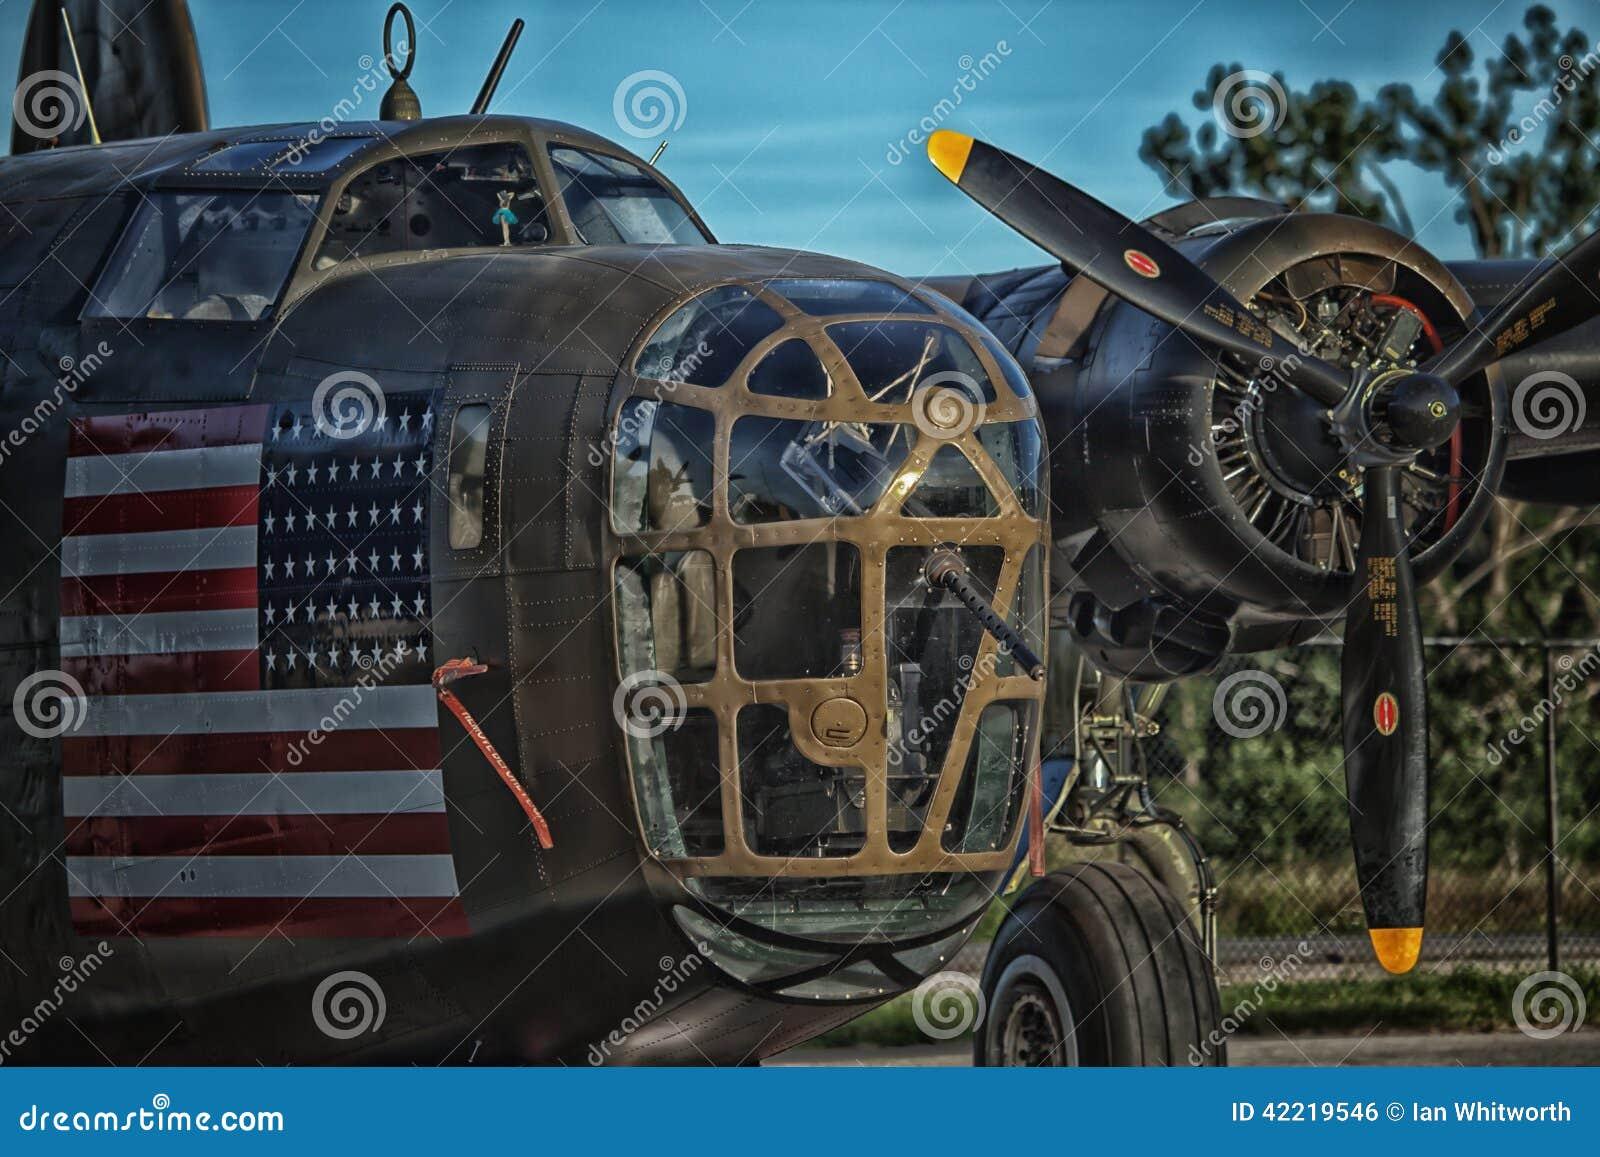 B24 Liberator Heavy Bomber editorial photo  Image of vintage